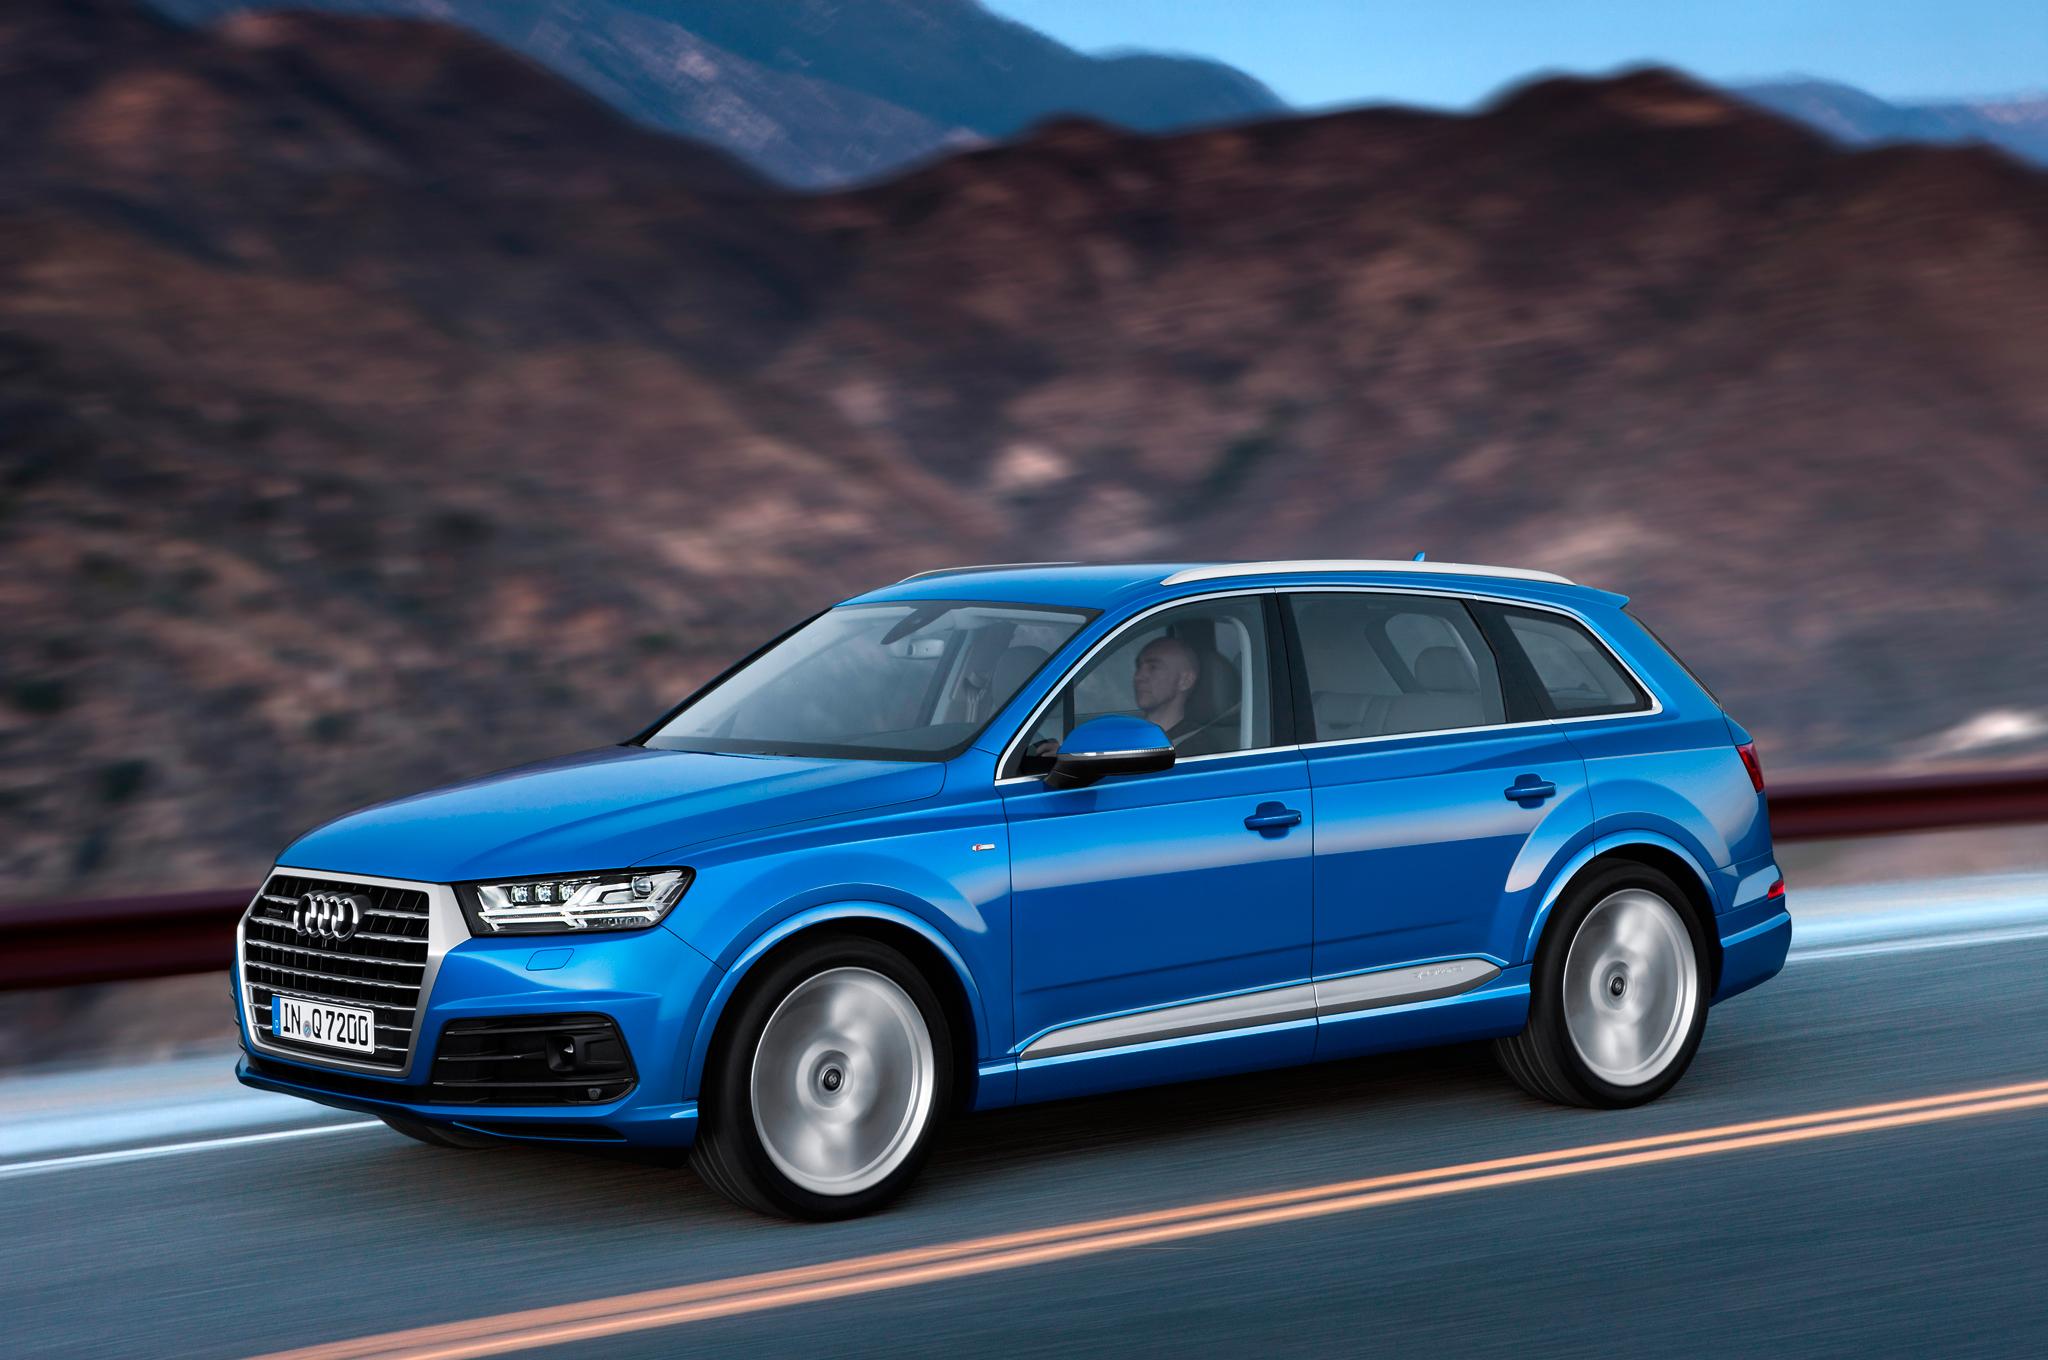 2016 Audi Q7 Performance Test